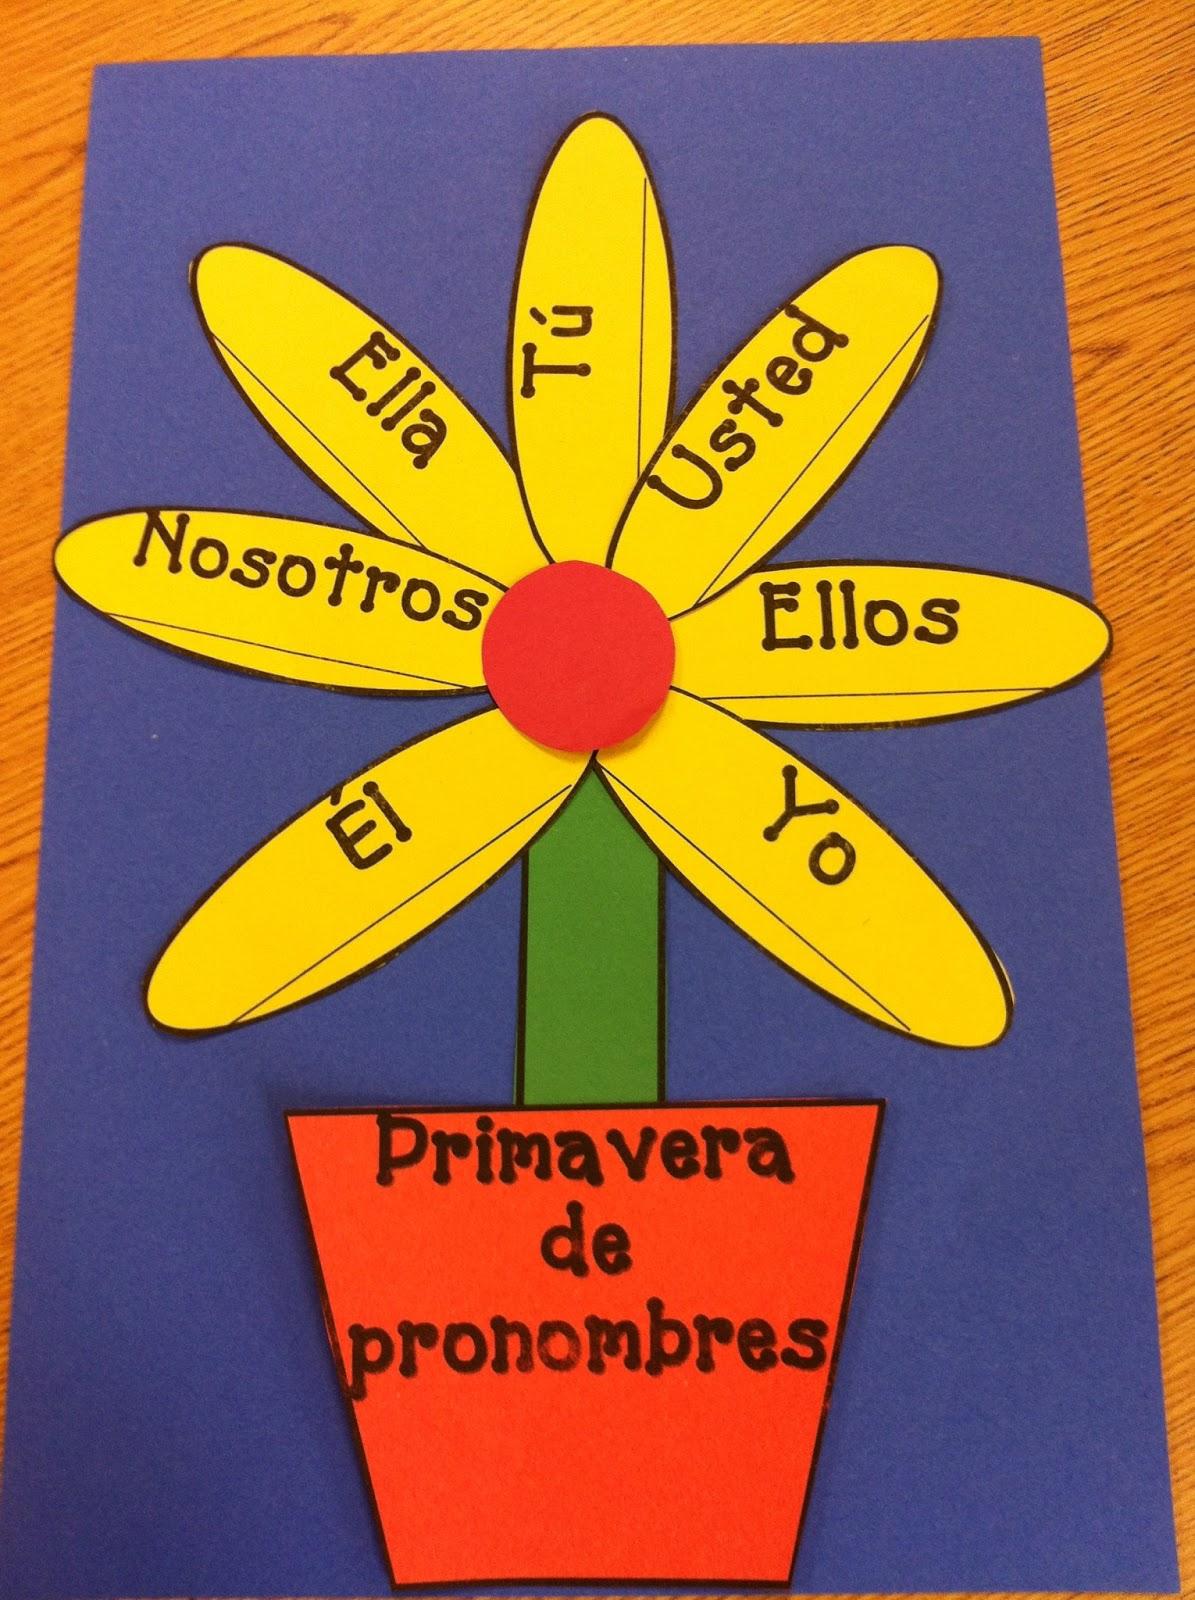 B Is For Bilingual Spring Break Is Here